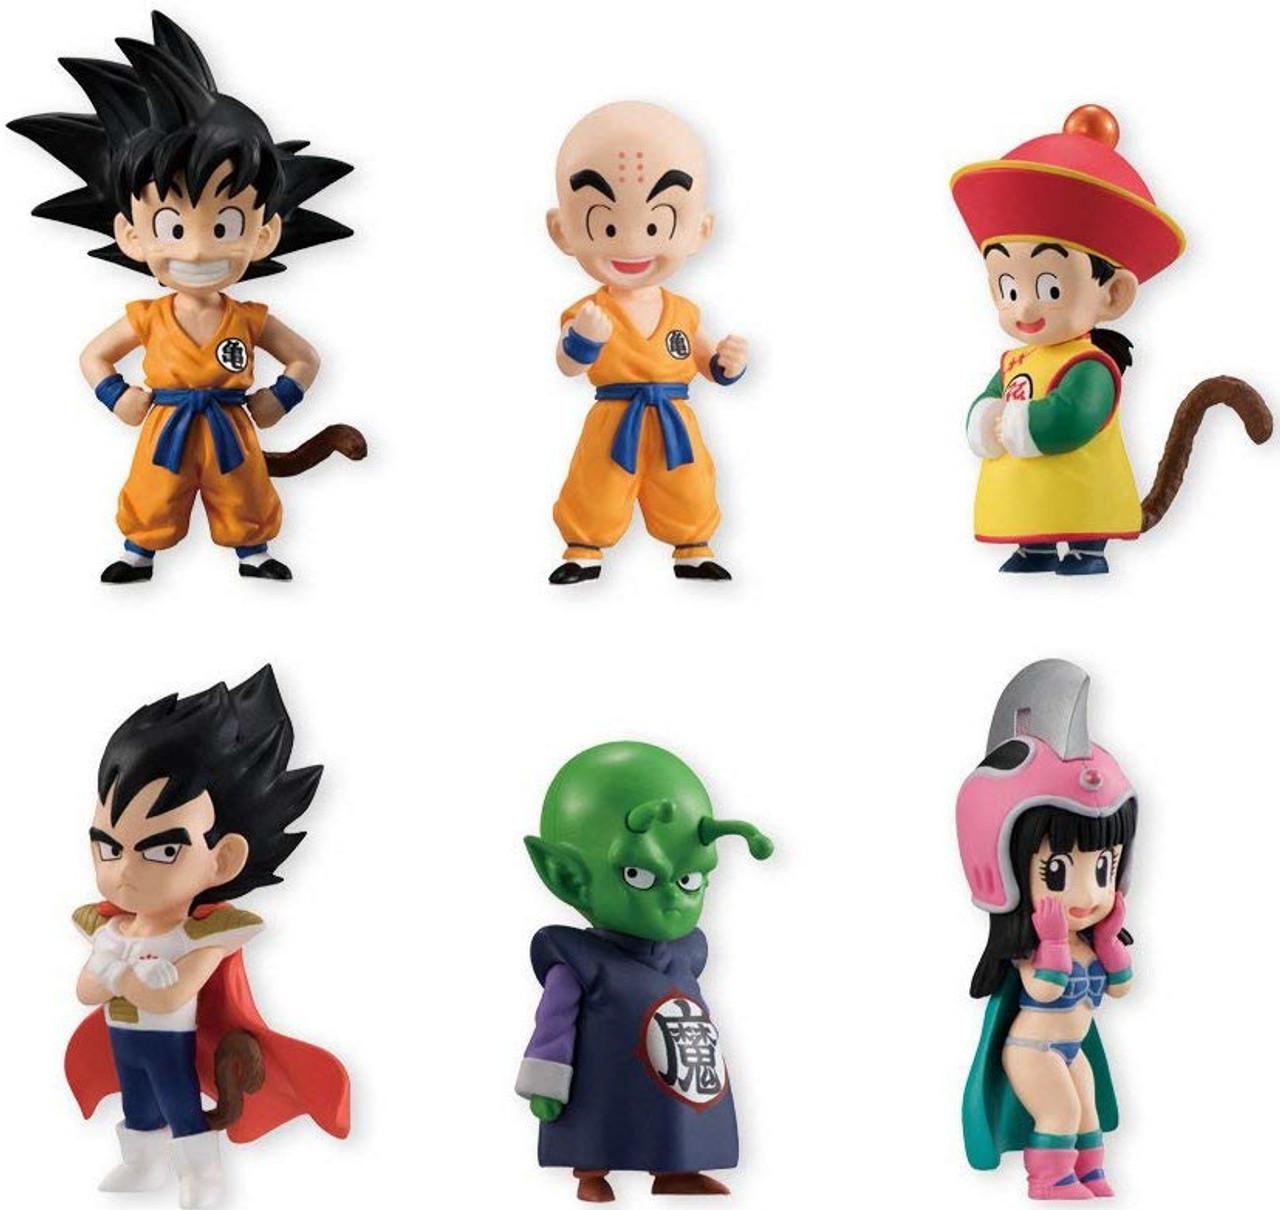 DRAGON BALL Minifigure Lego custom Goku Gohan Vegeta cell junior Majin bu